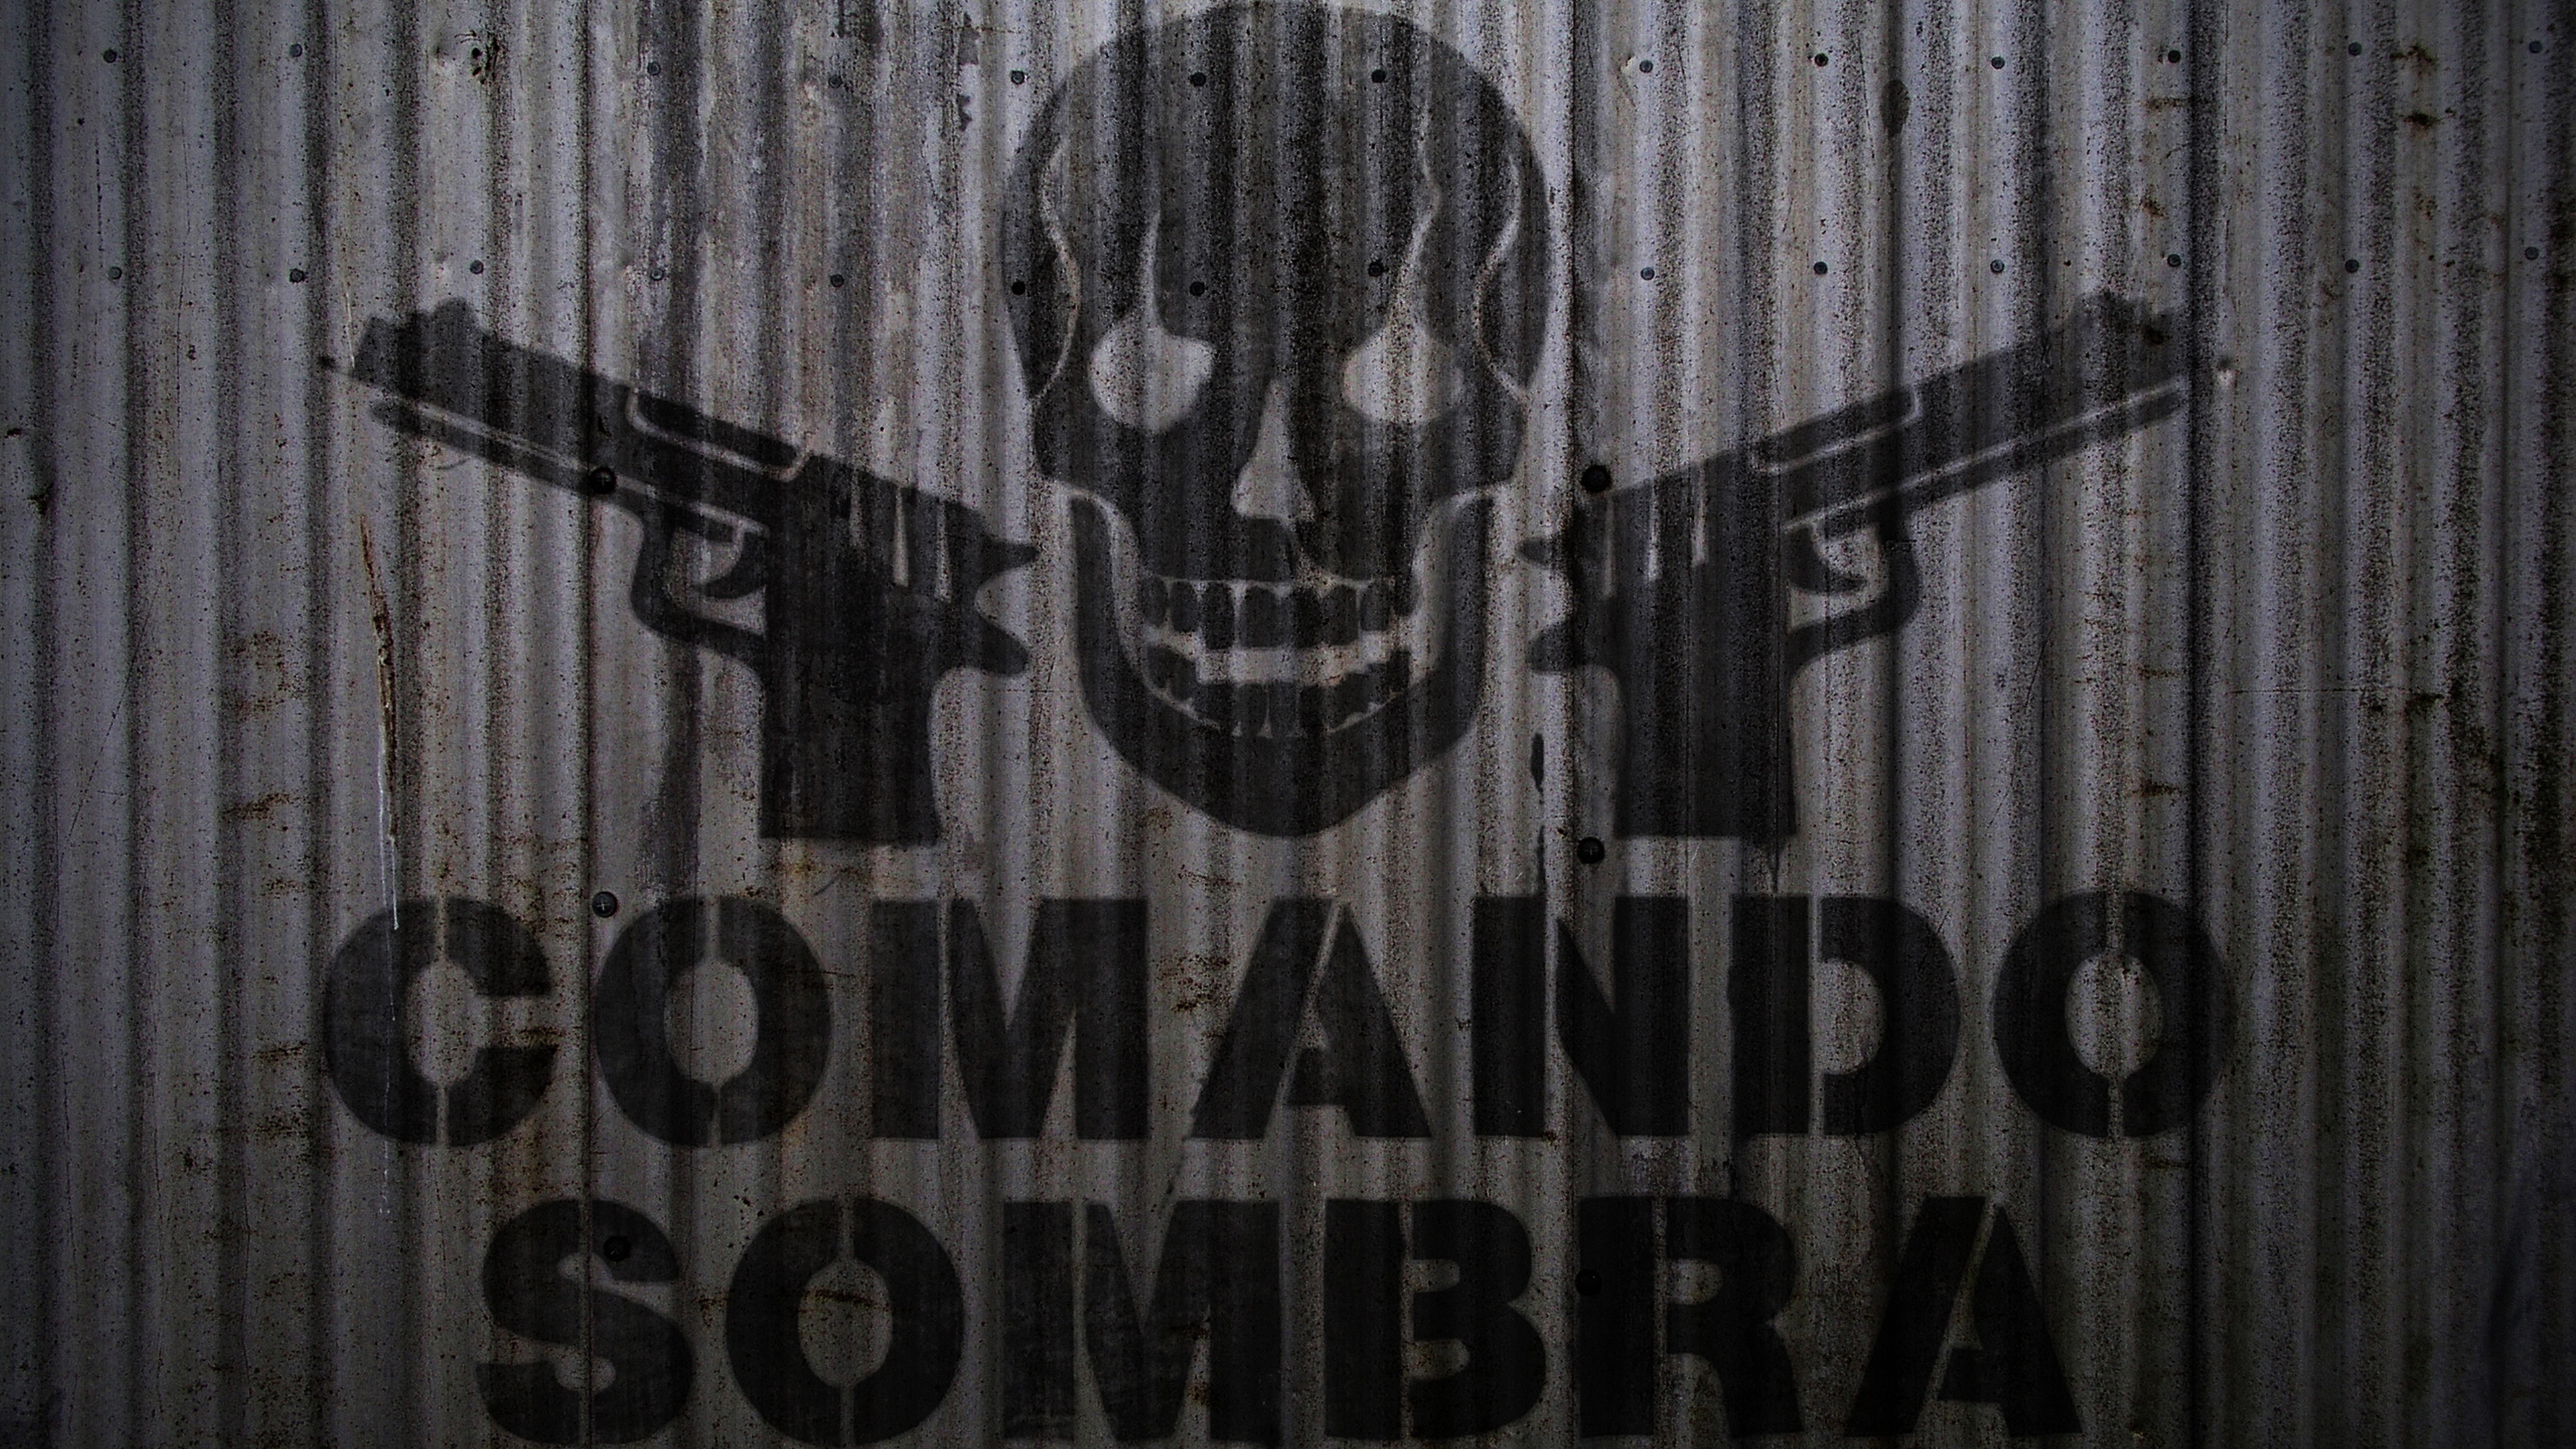 4k Max Payne 3 Comando Sombra Wallpaper Hd